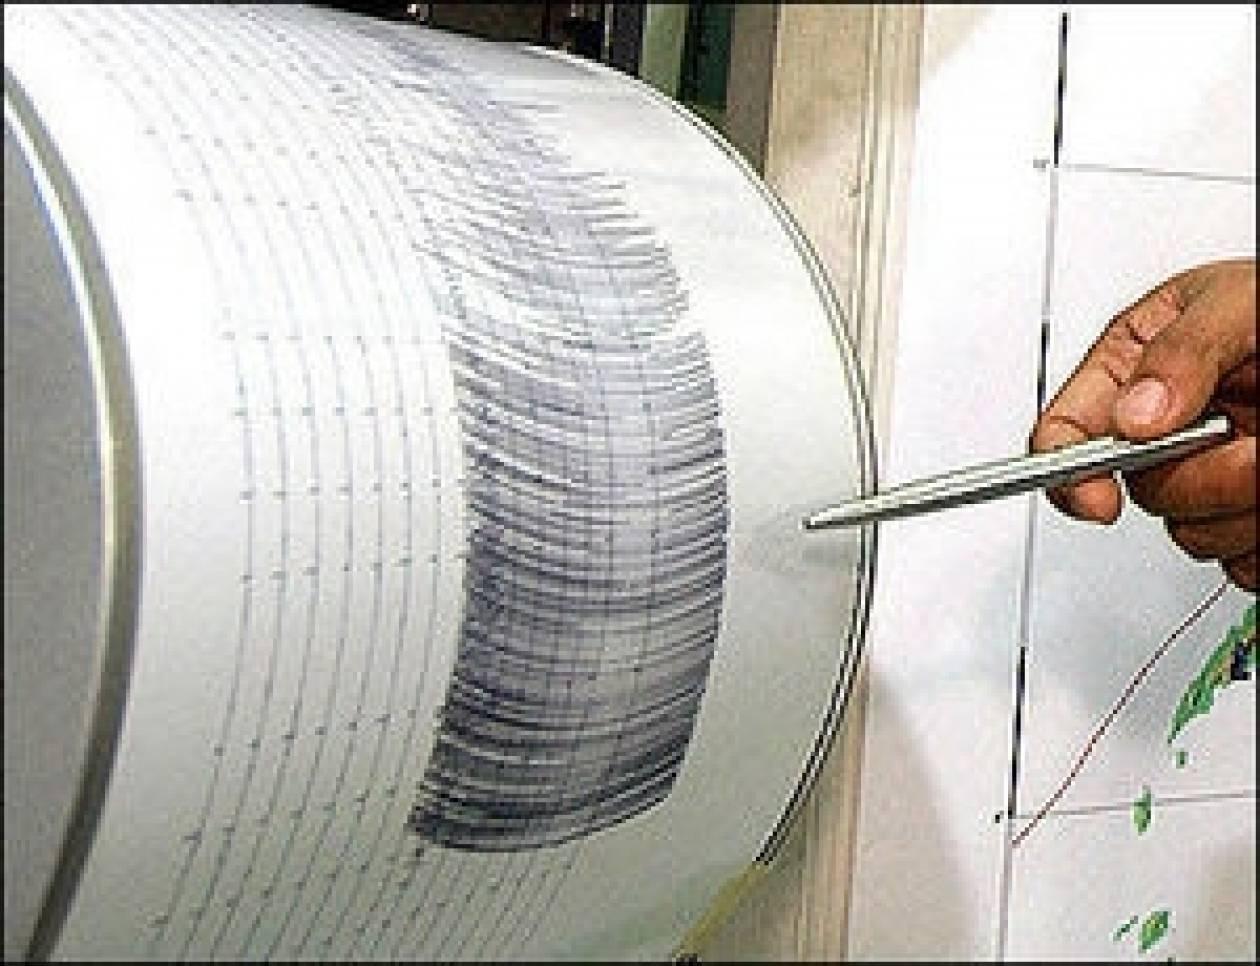 4 Richter earthquake in Κozani